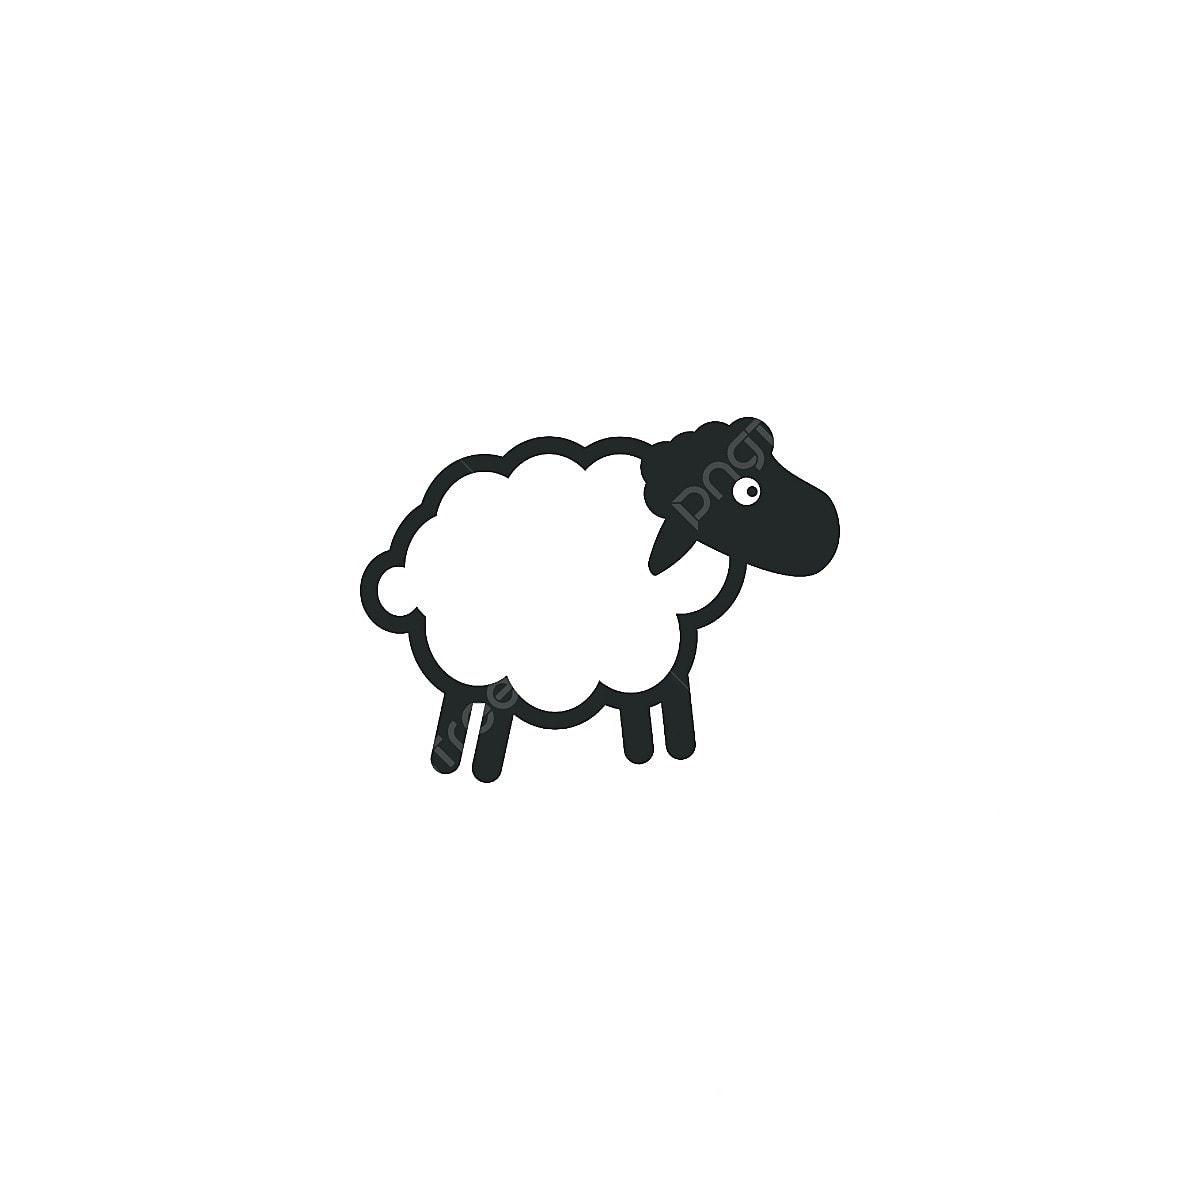 Sheep Logo Template Eid Al Adha, Sheep, Icon, Symbol PNG and